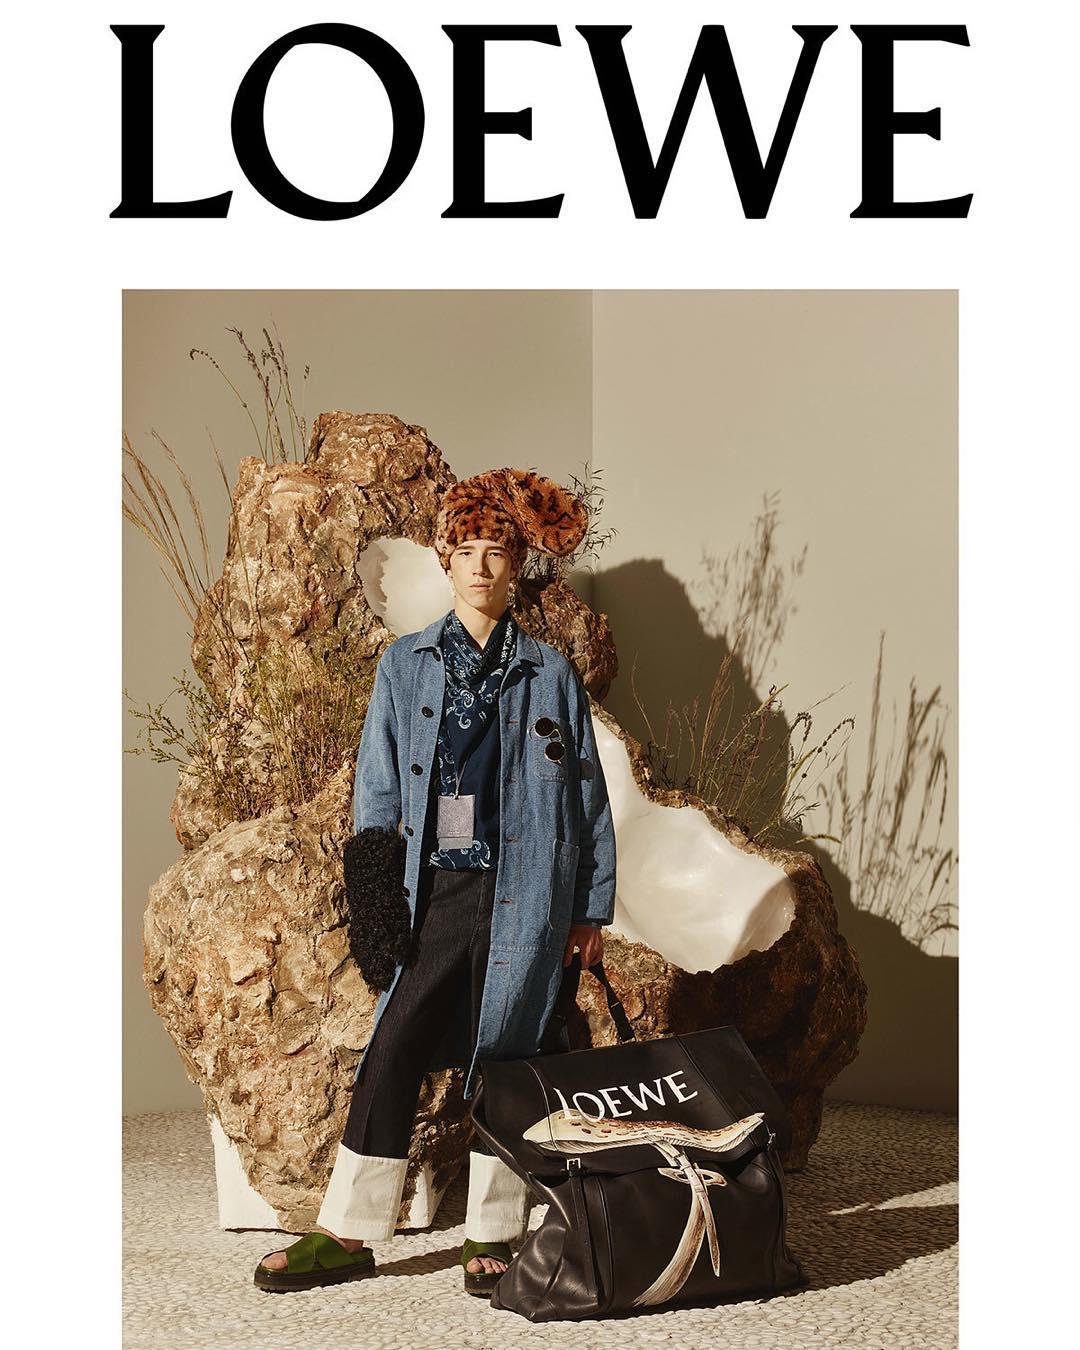 Photo Loewe F/W 16/17 Campaign by Steven Meisel